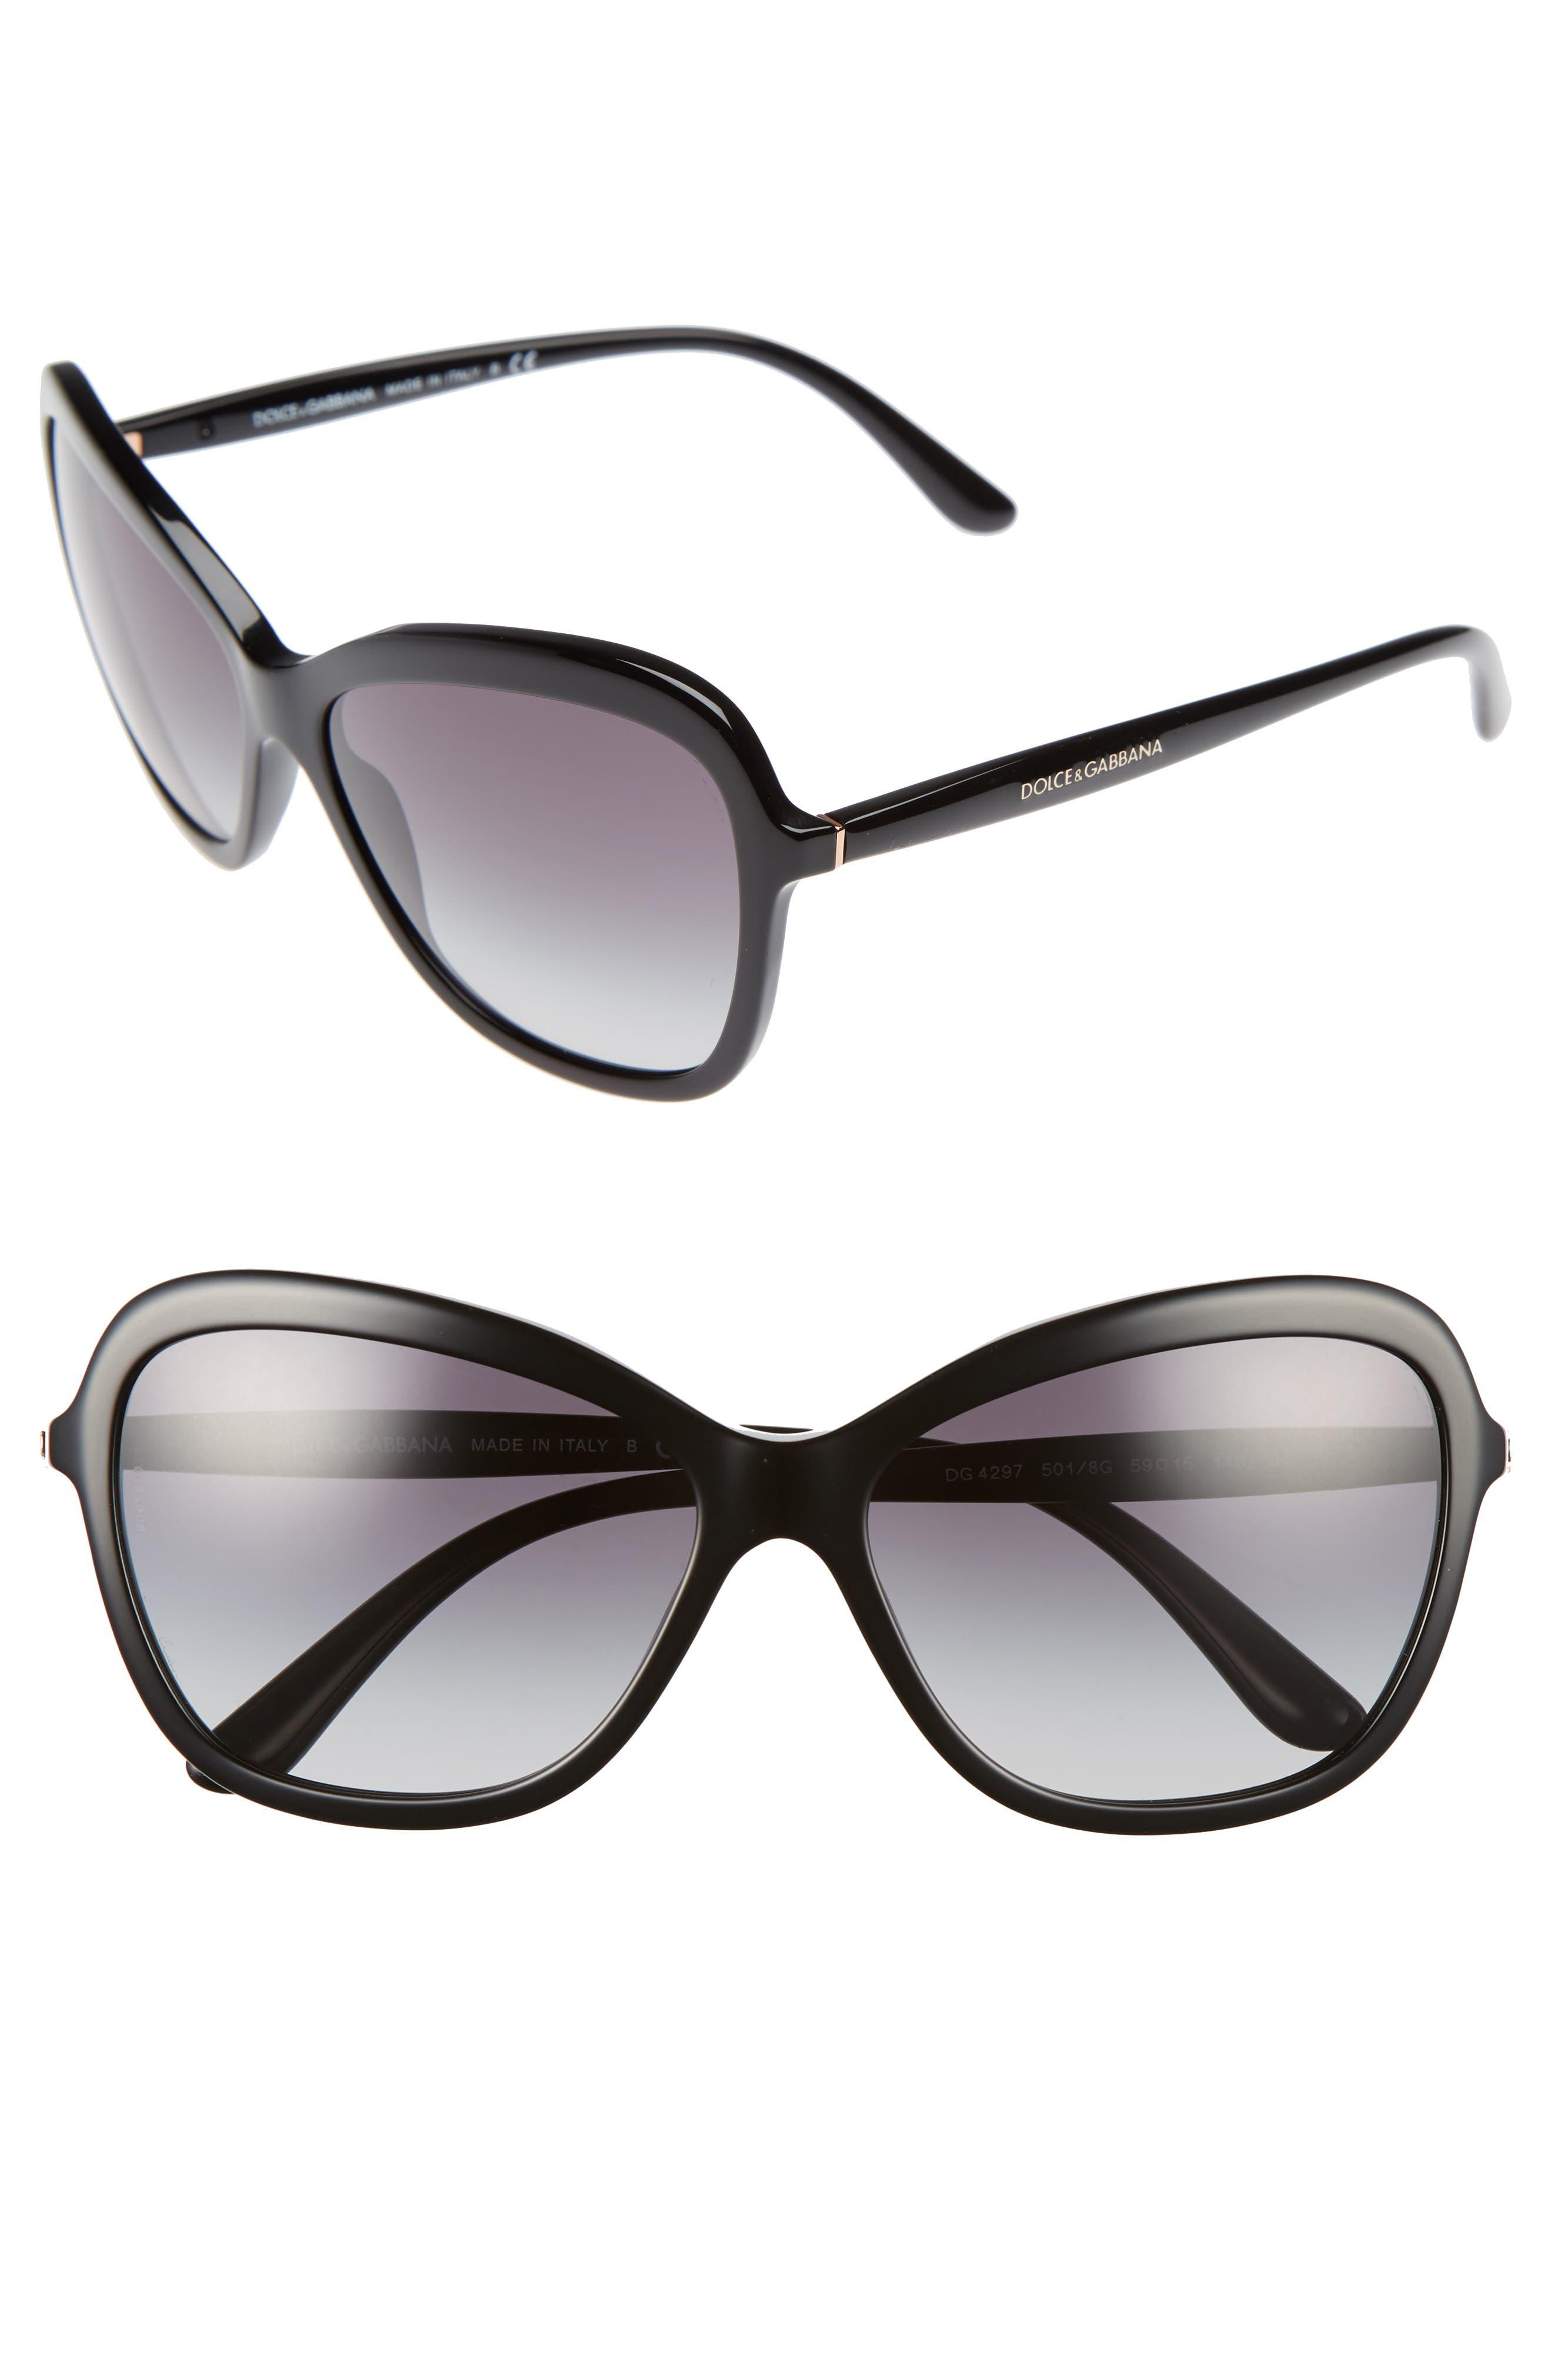 Dolce&Gabbana 59mm Gradient Butterfly Sunglasses